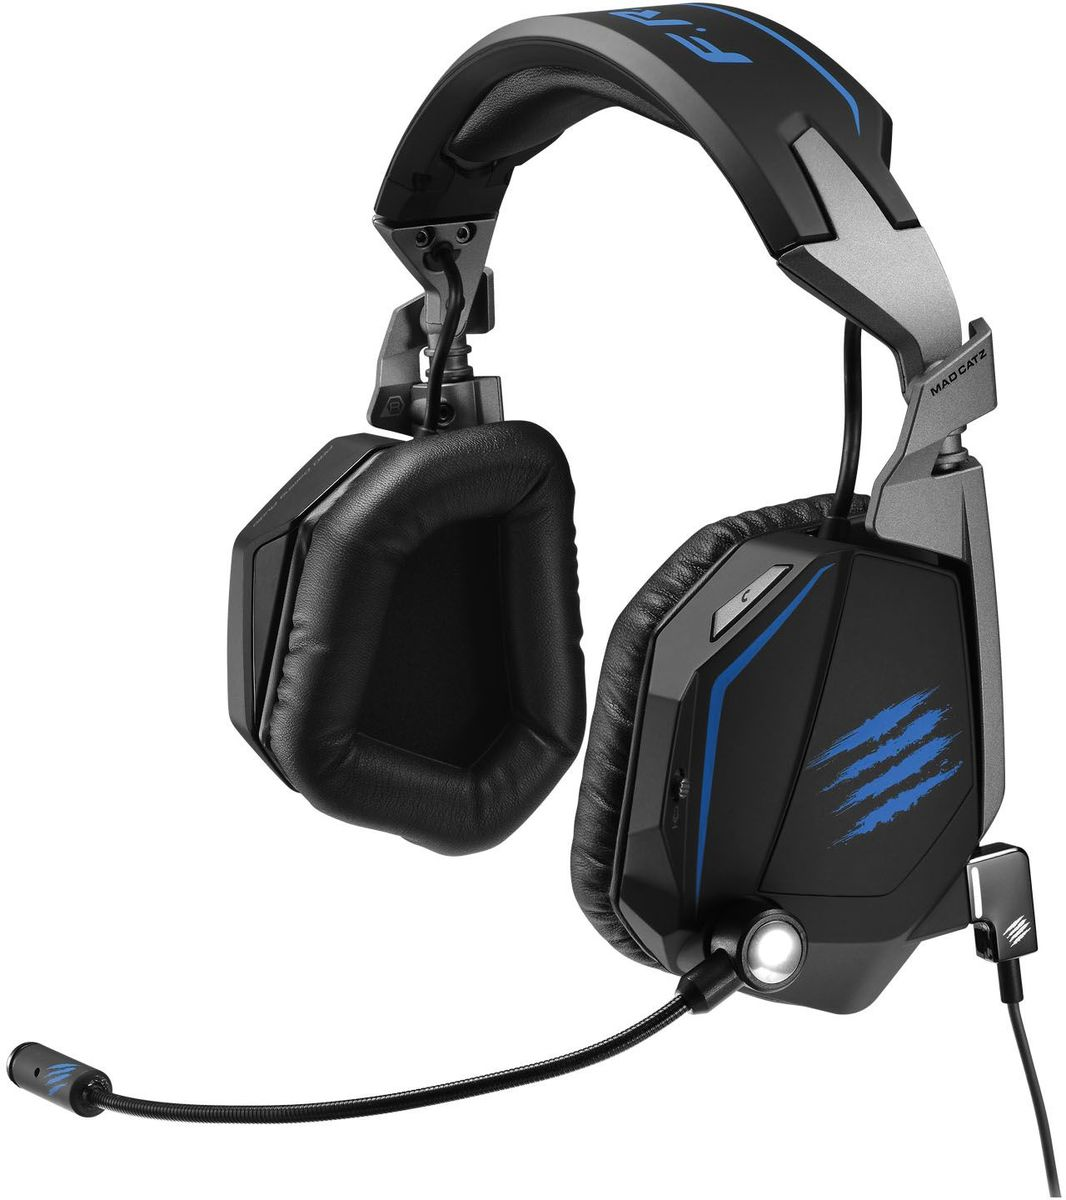 Mad Catz F.R.E.Q.ТЕ 7.1 Stereo Surround Headset игровые наушники мышь mad catz rat 1 black red mcb4373800a3 06 1